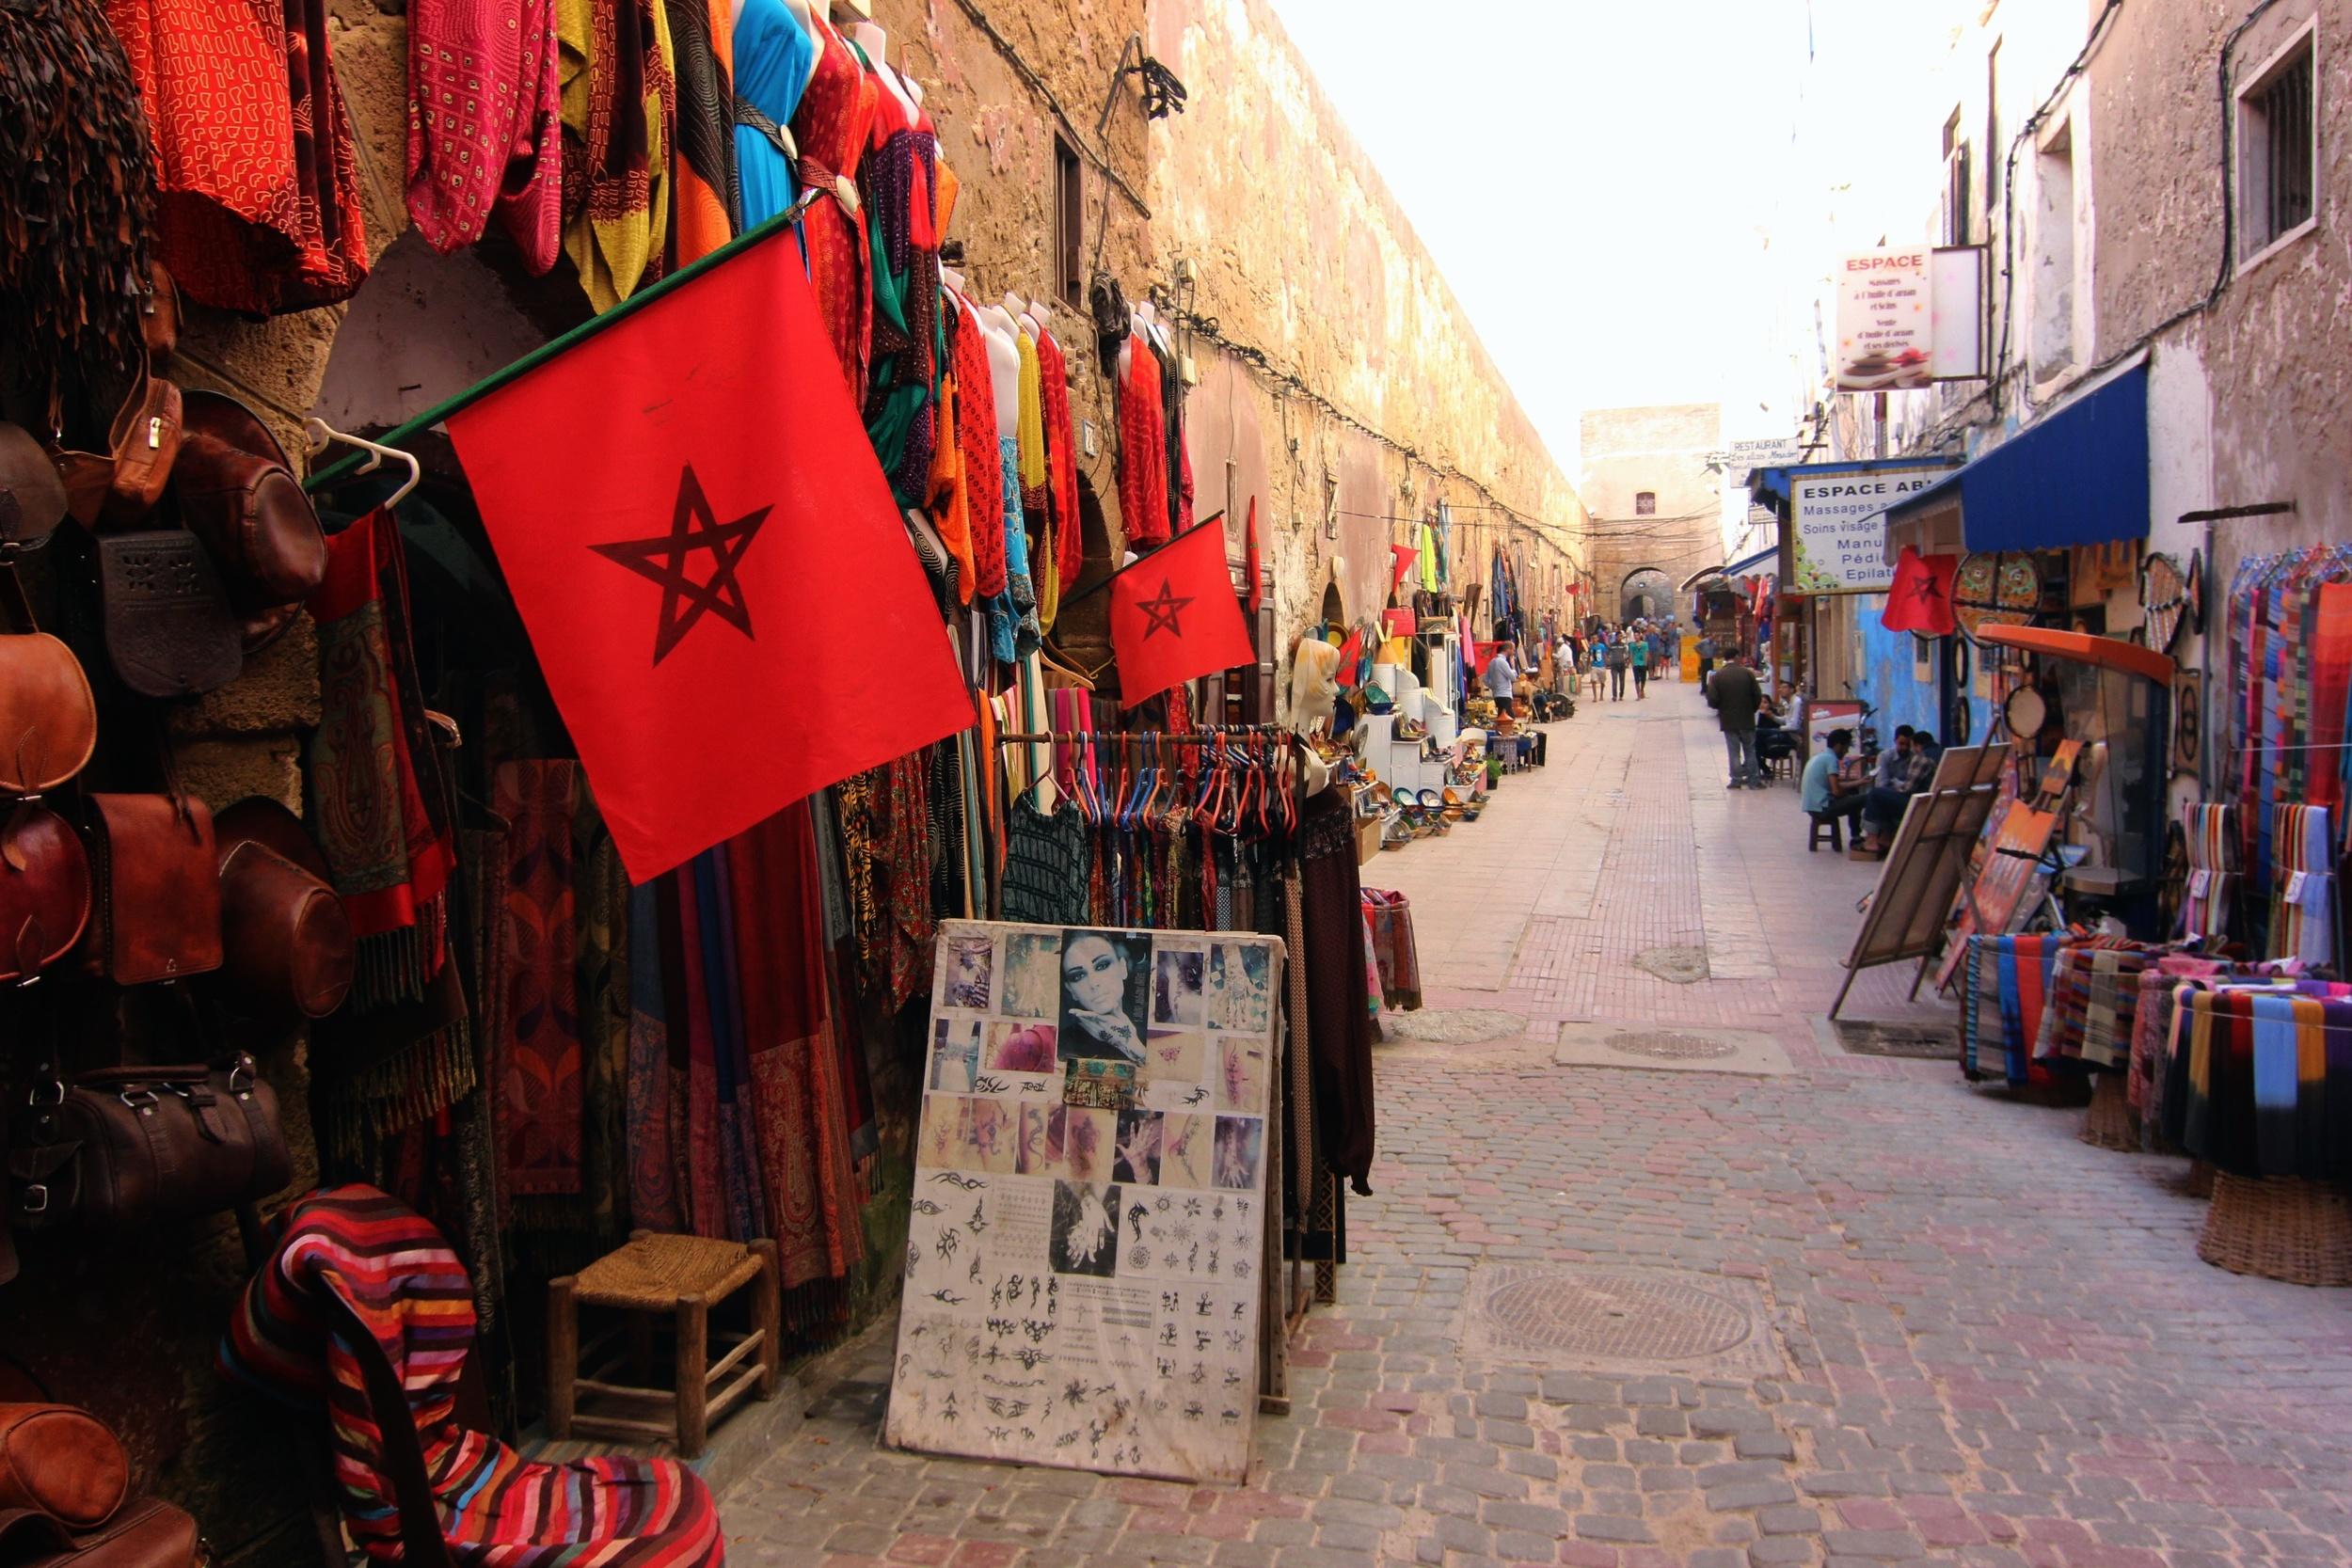 Essaouira, by far my favorite place.